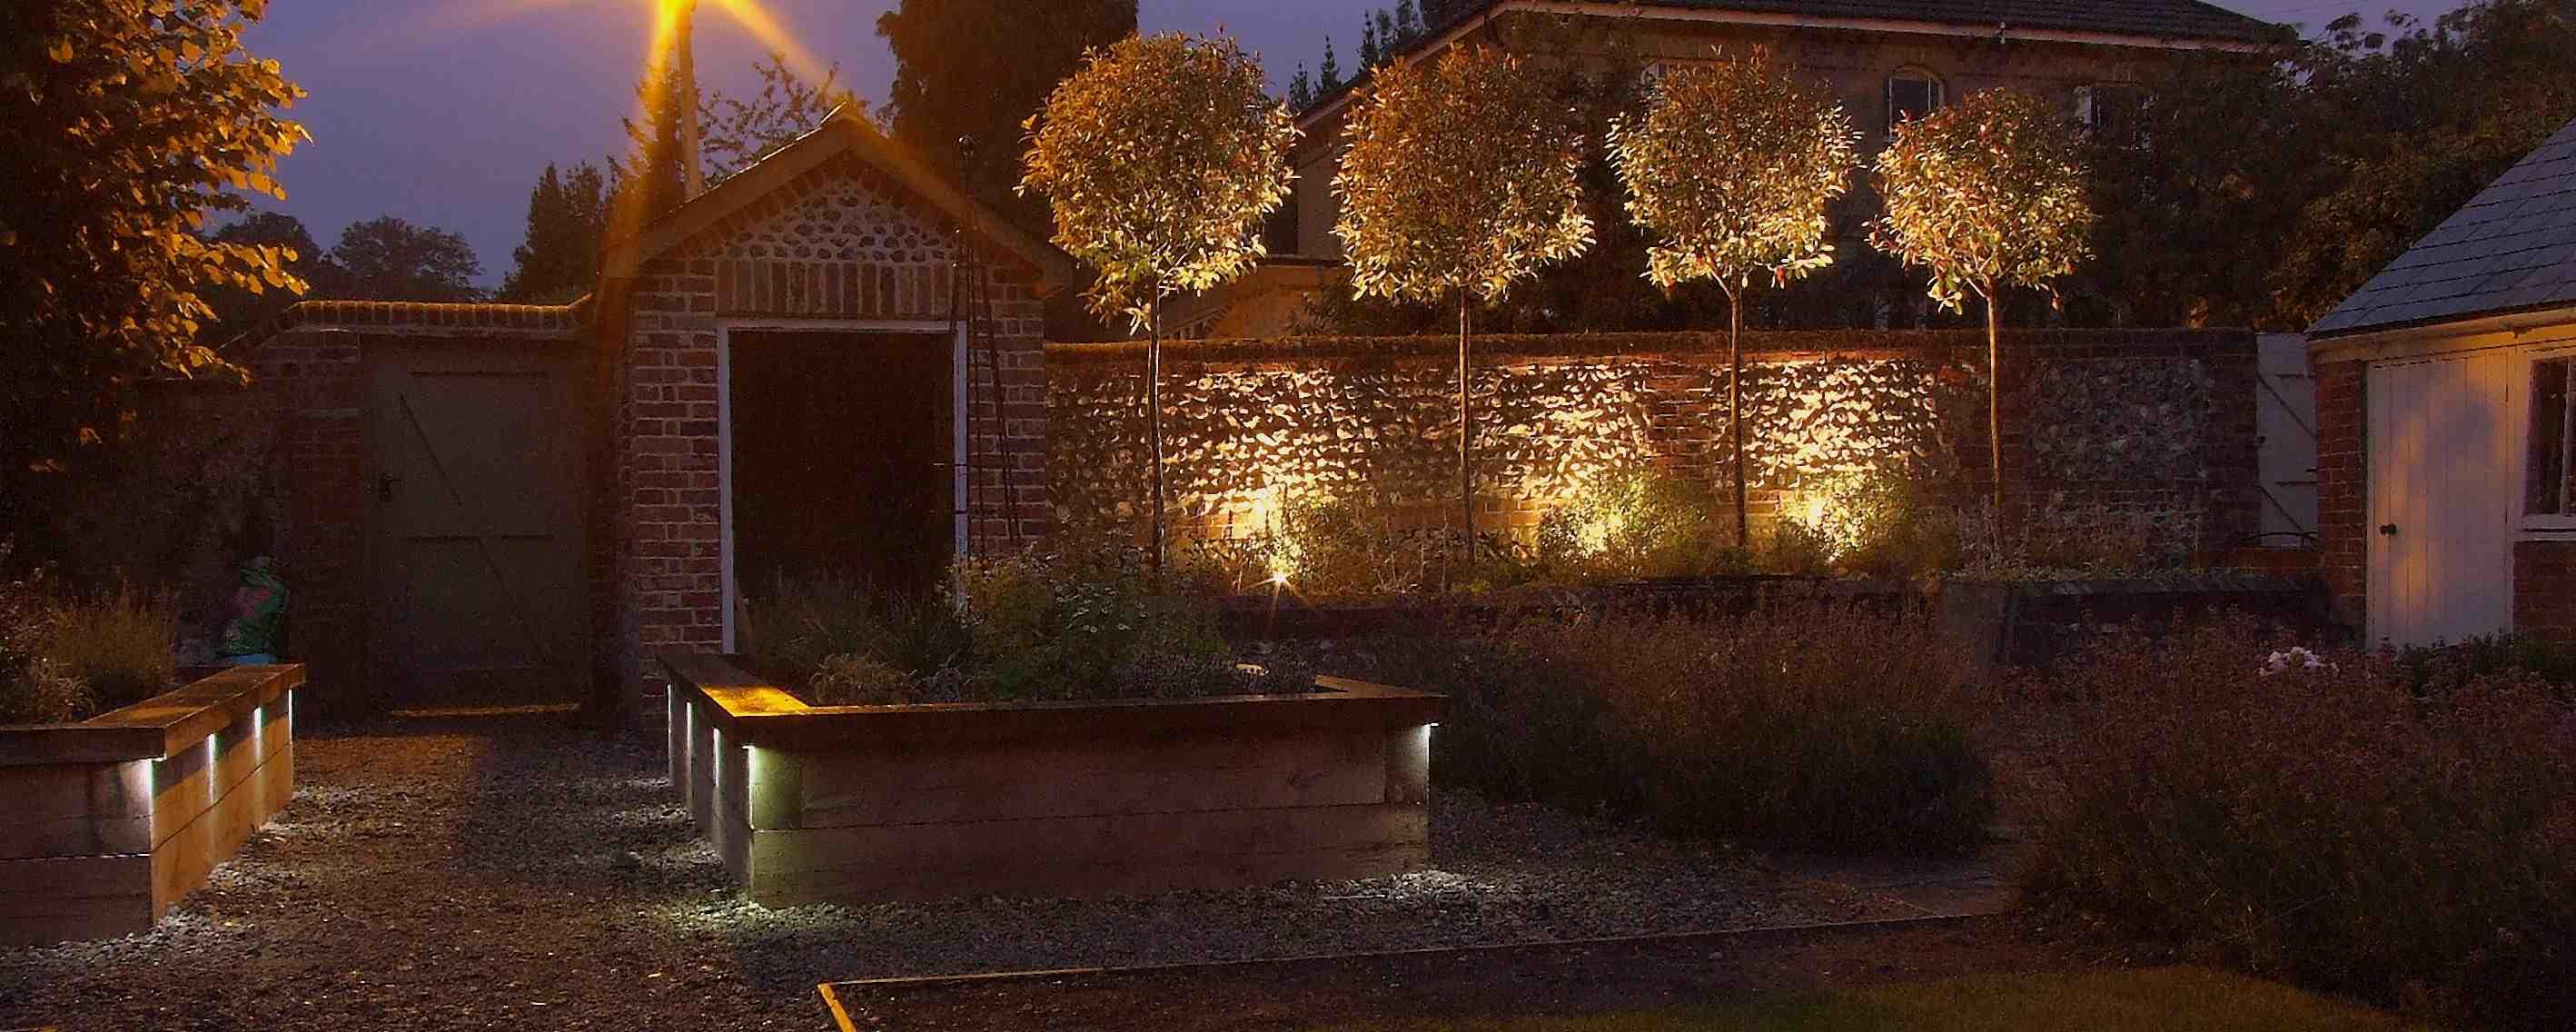 Genial Smart Gardens #2: Garden Lighting Ideas   Loxone Blog